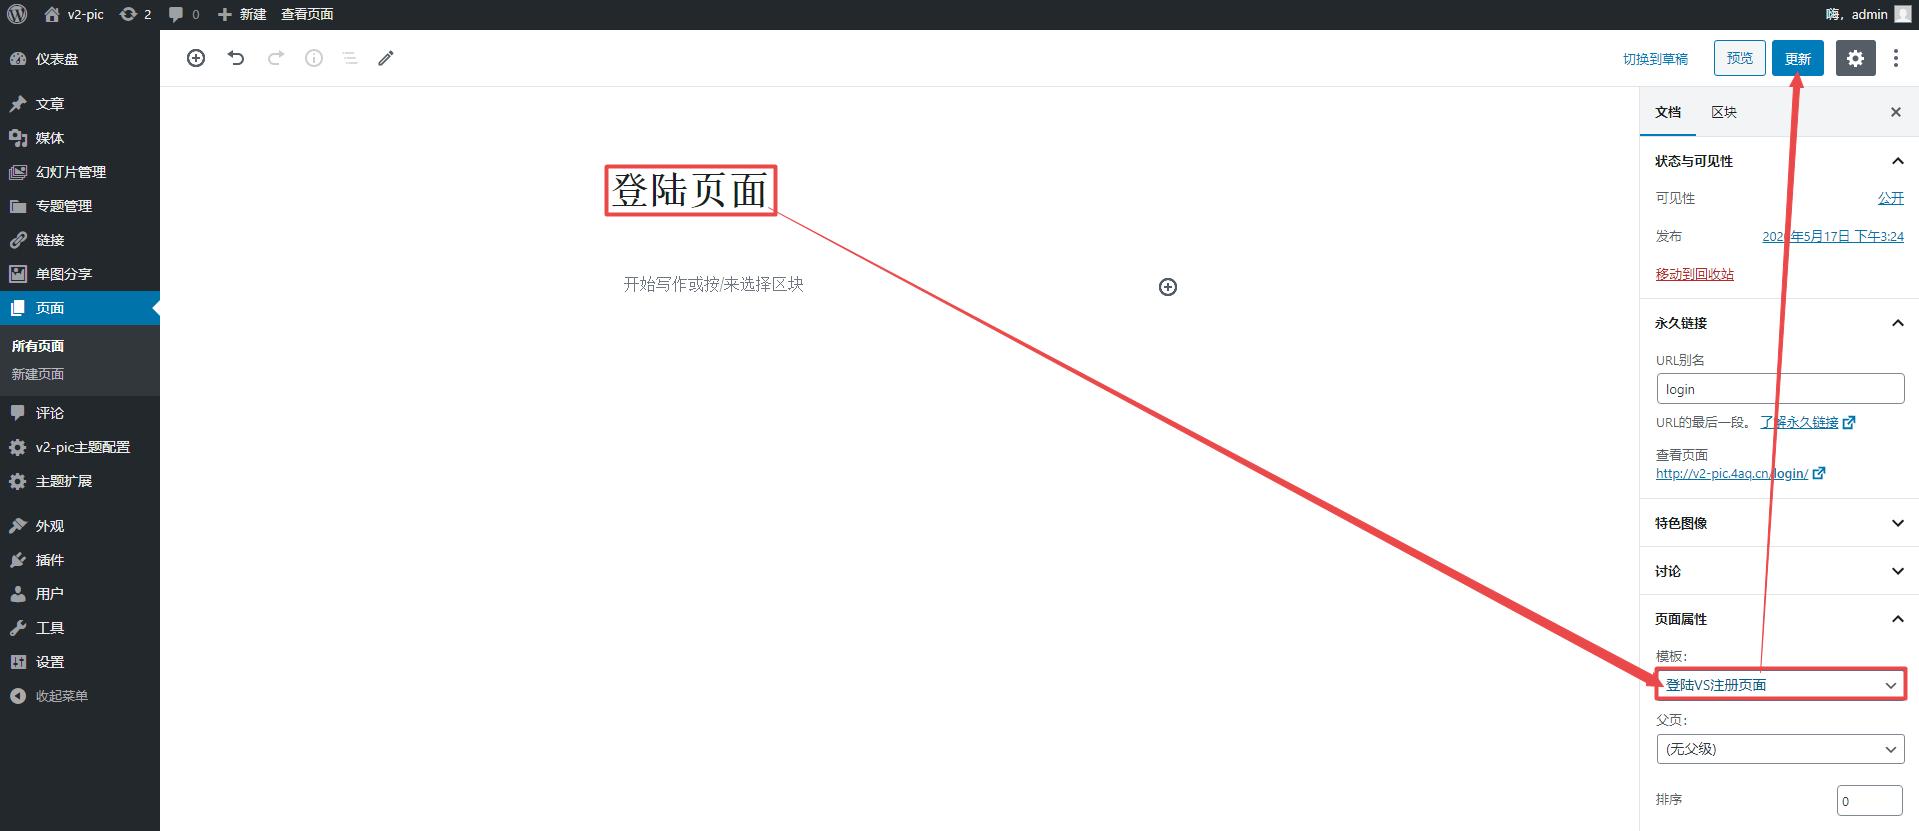 CX-UDY3.1最新破解版全解密去授权版无限制美女图片站